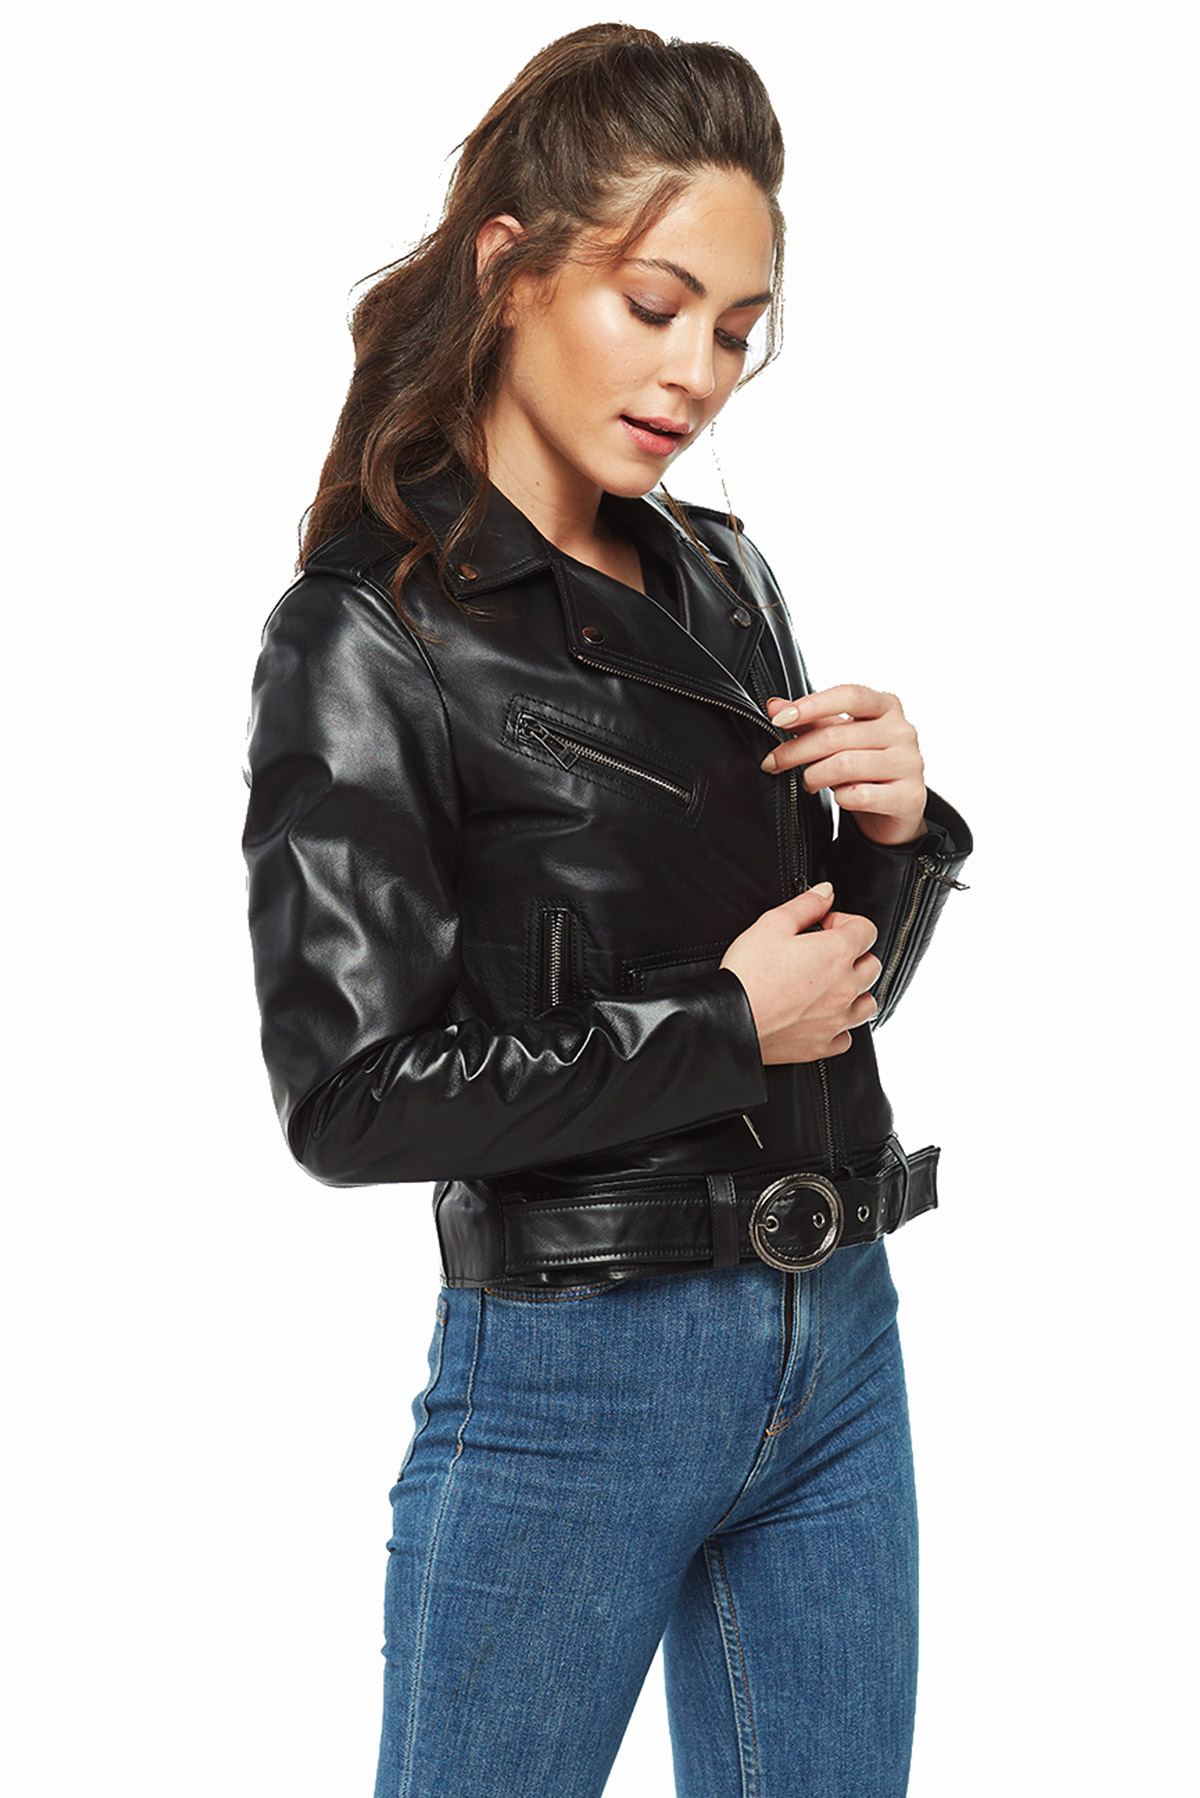 ladies long leather jacket